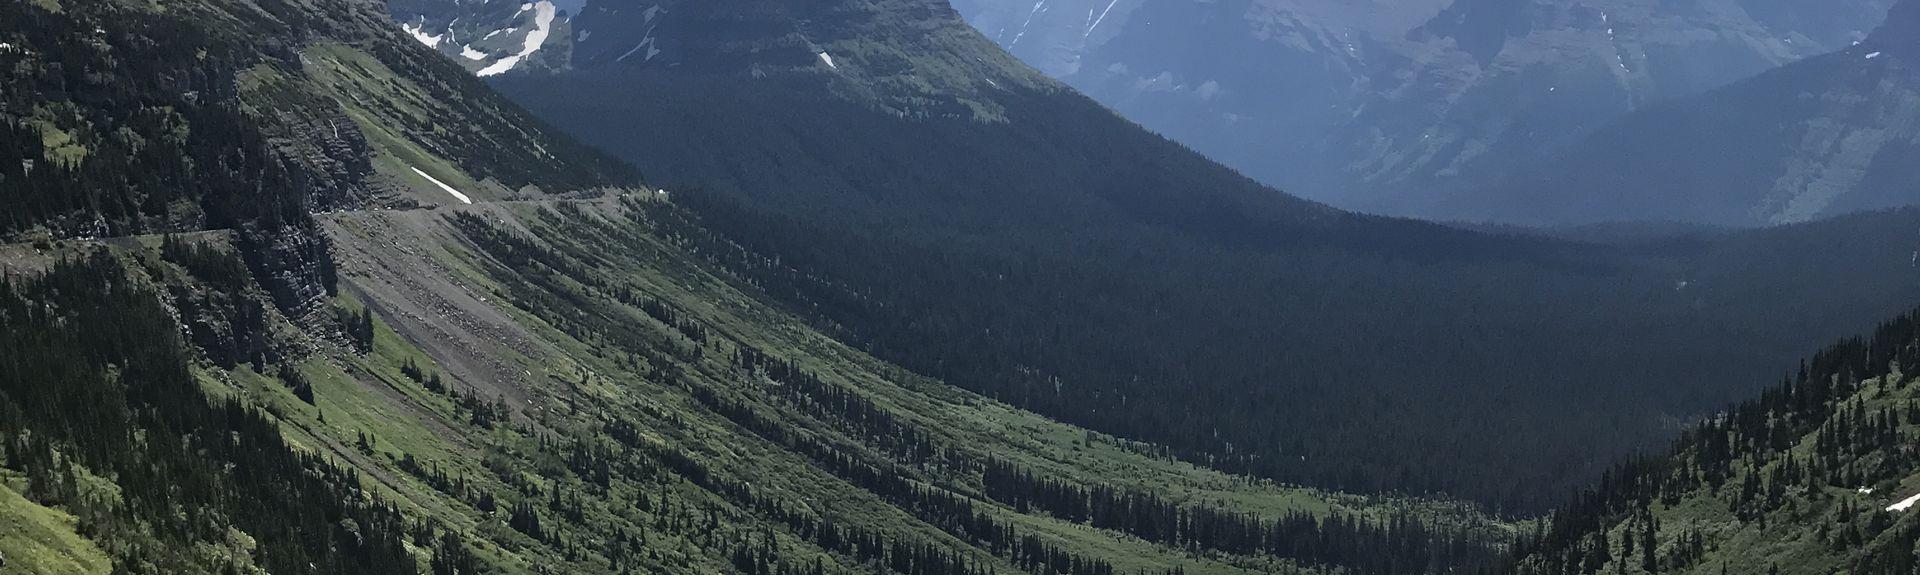 Lake County, Montana, United States of America